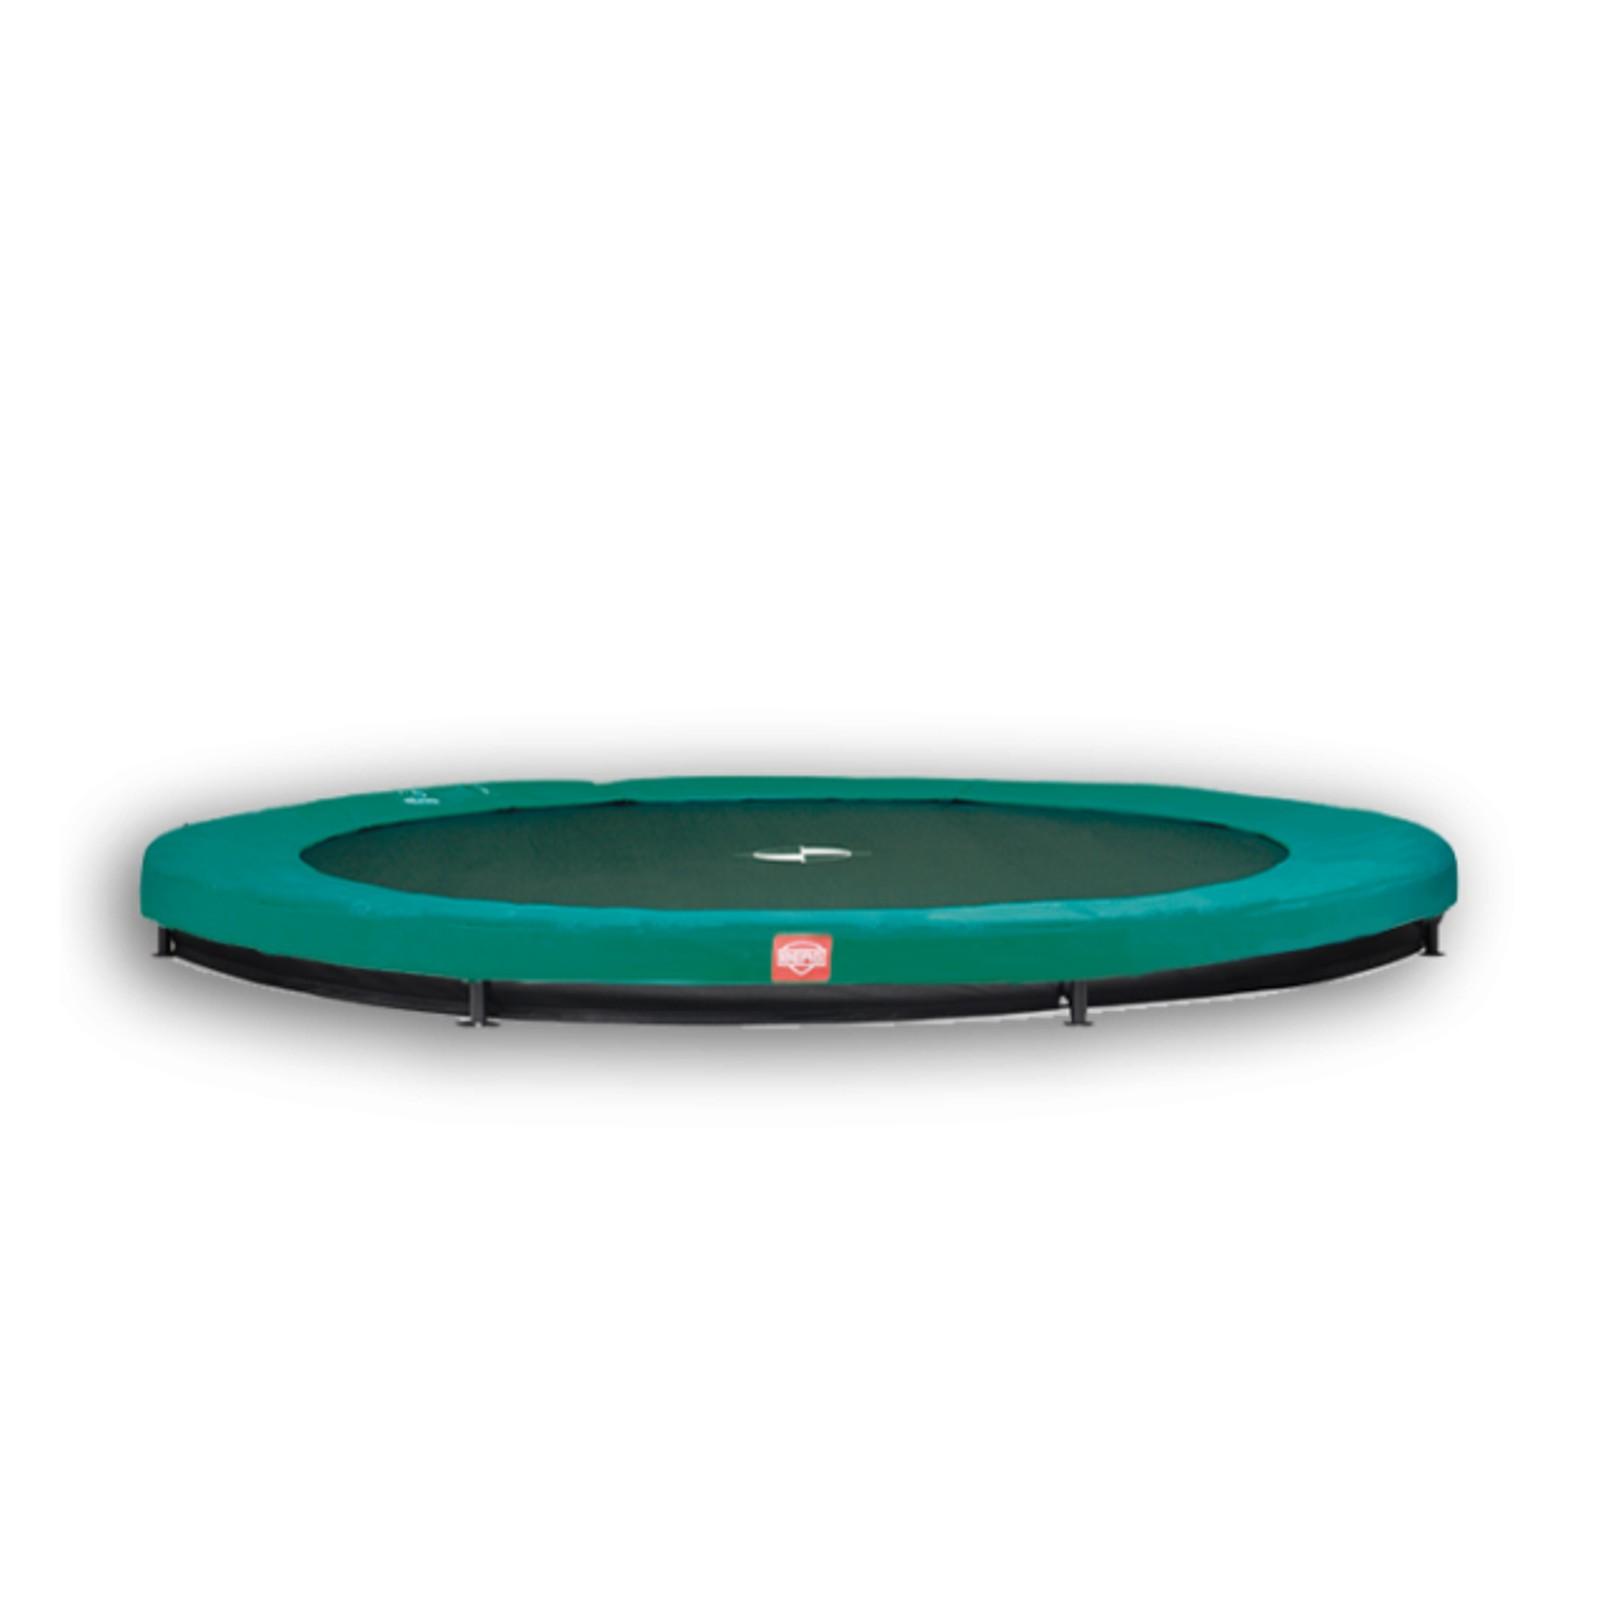 berg trampolin inground favorit 430 kopen met 29. Black Bedroom Furniture Sets. Home Design Ideas